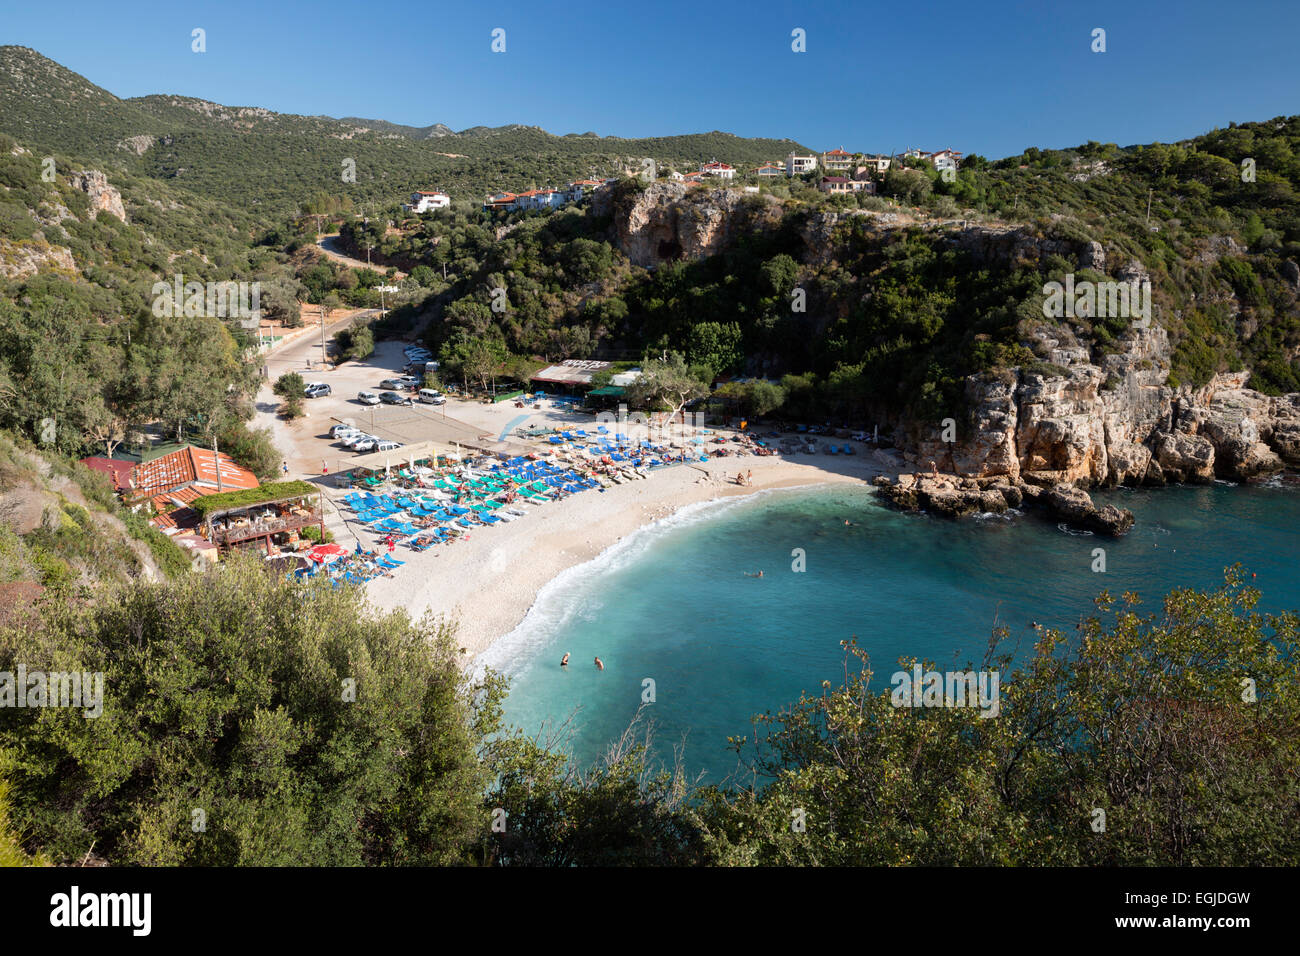 Buyuk Cakil beach, Kas, Lycia, Antalya Province, Mediterranean Coast, Southwest Turkey, Turkey, Asia - Stock Image